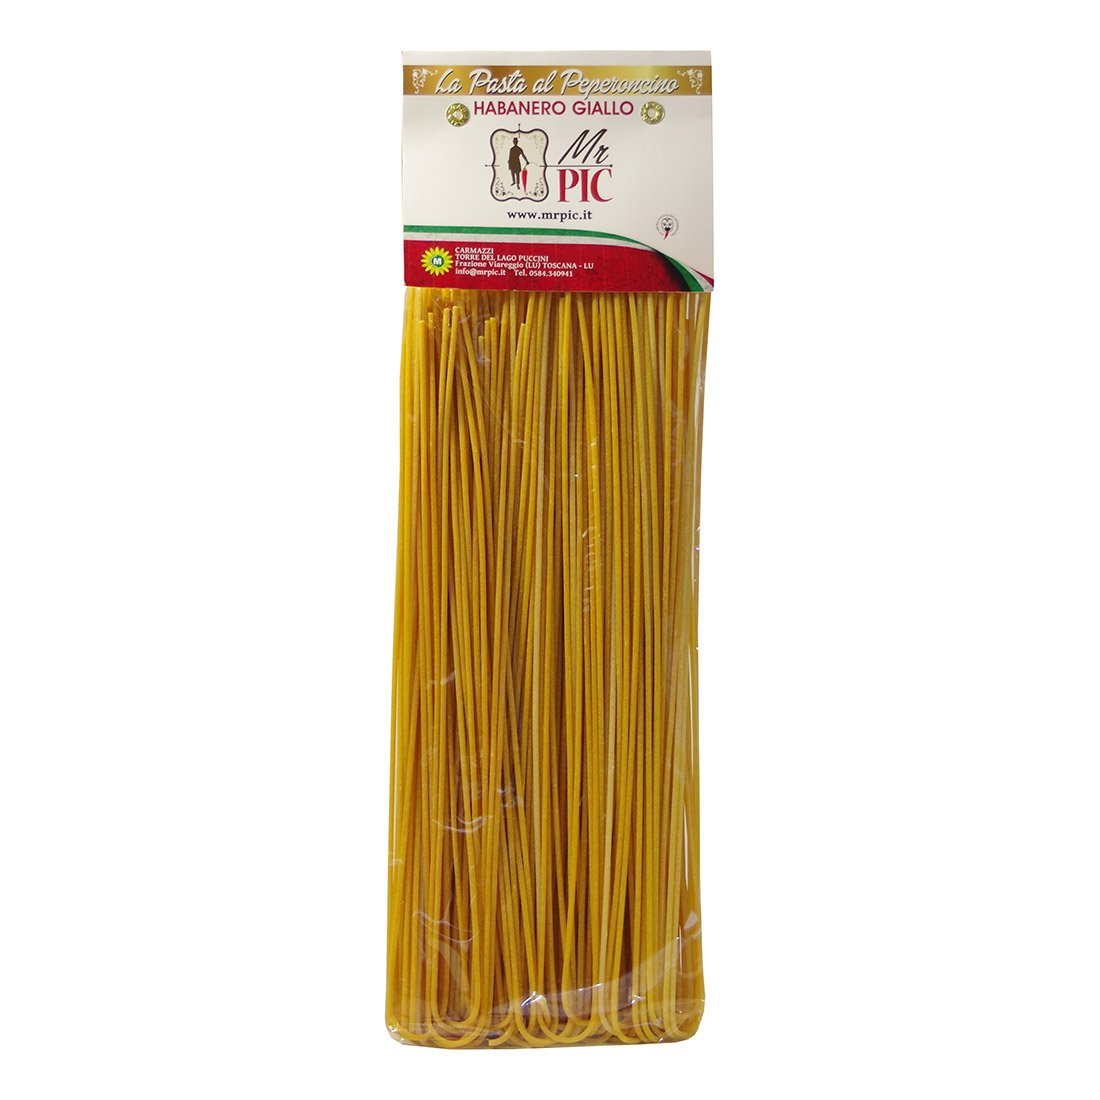 Spaghetti Habanero Giallo